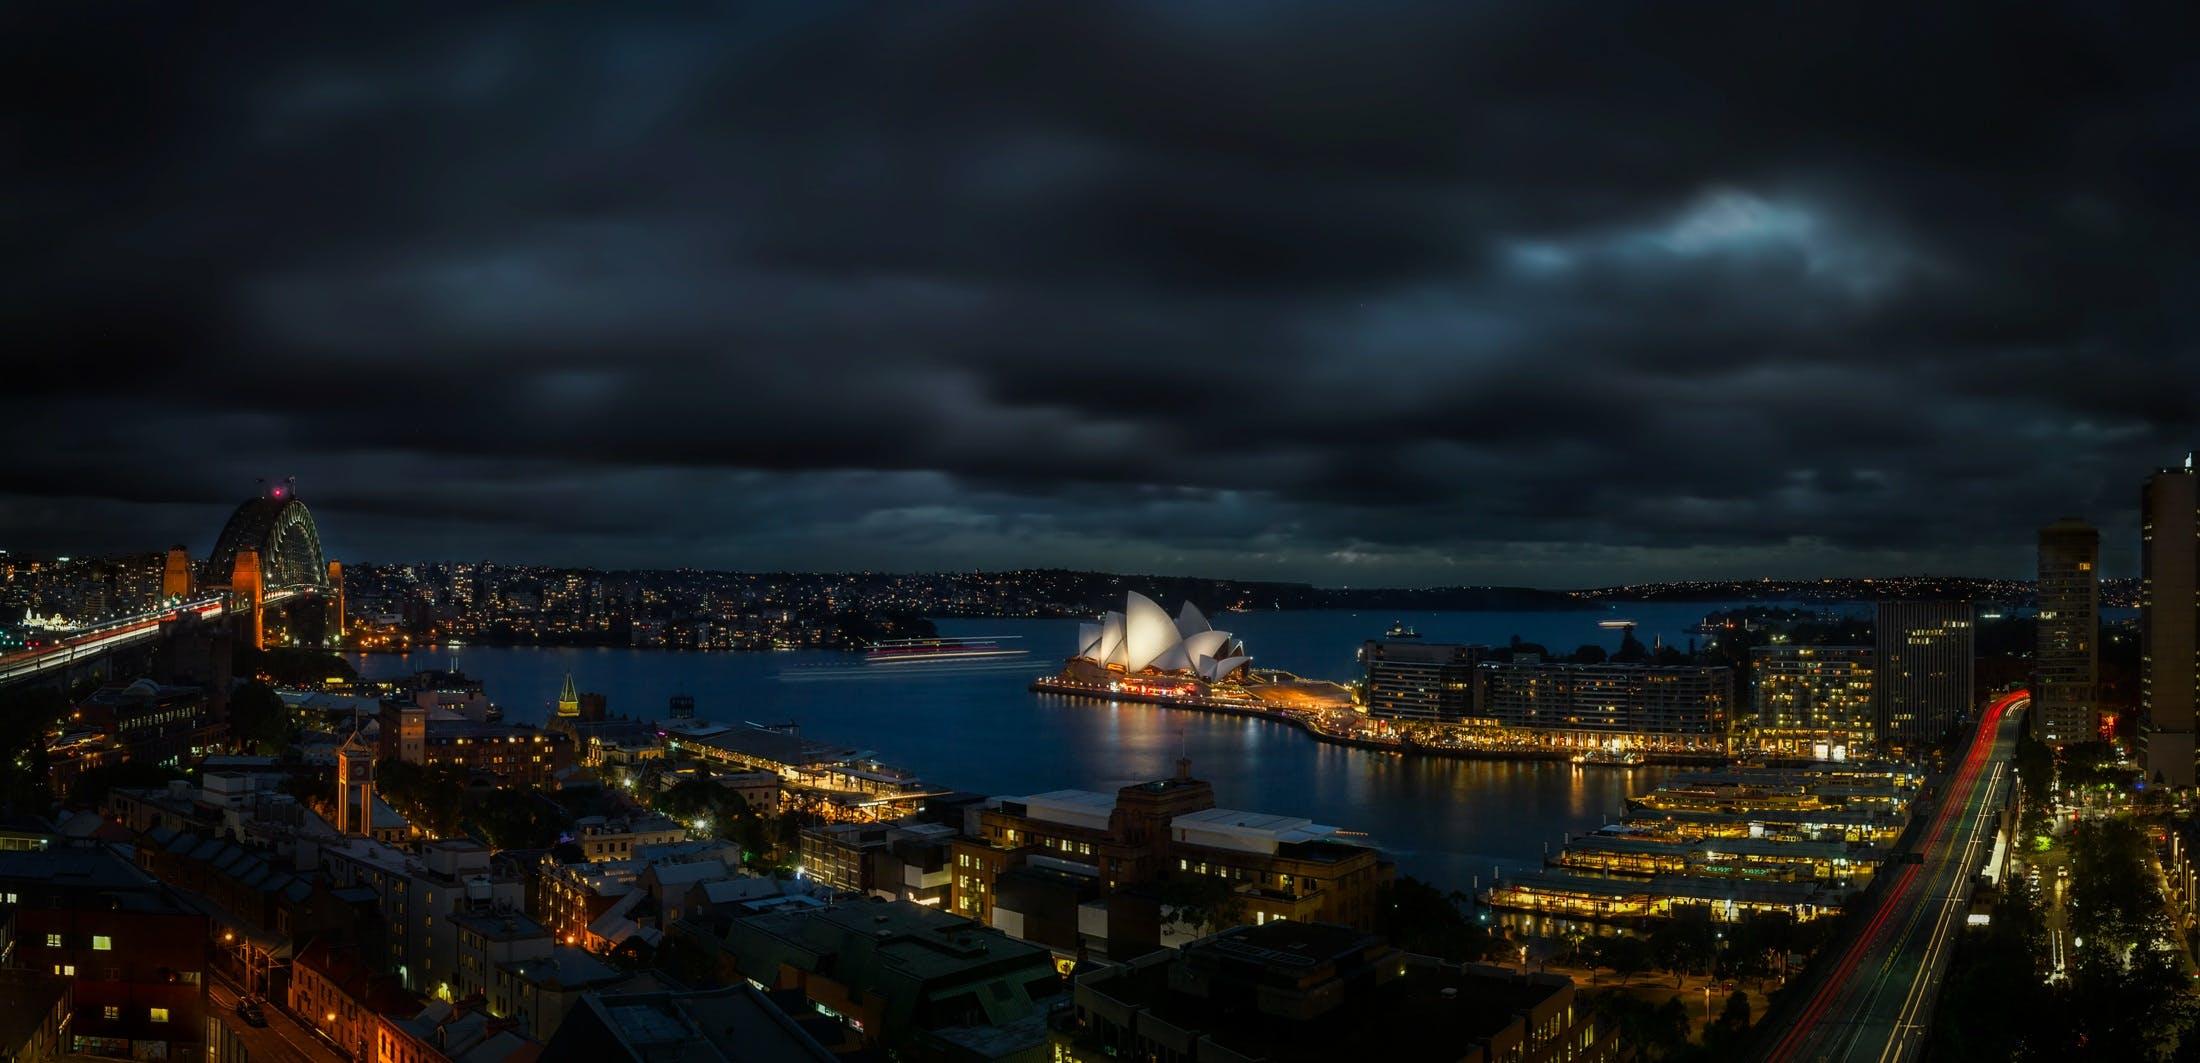 Top View Photography of Sydney Opera House, Australia